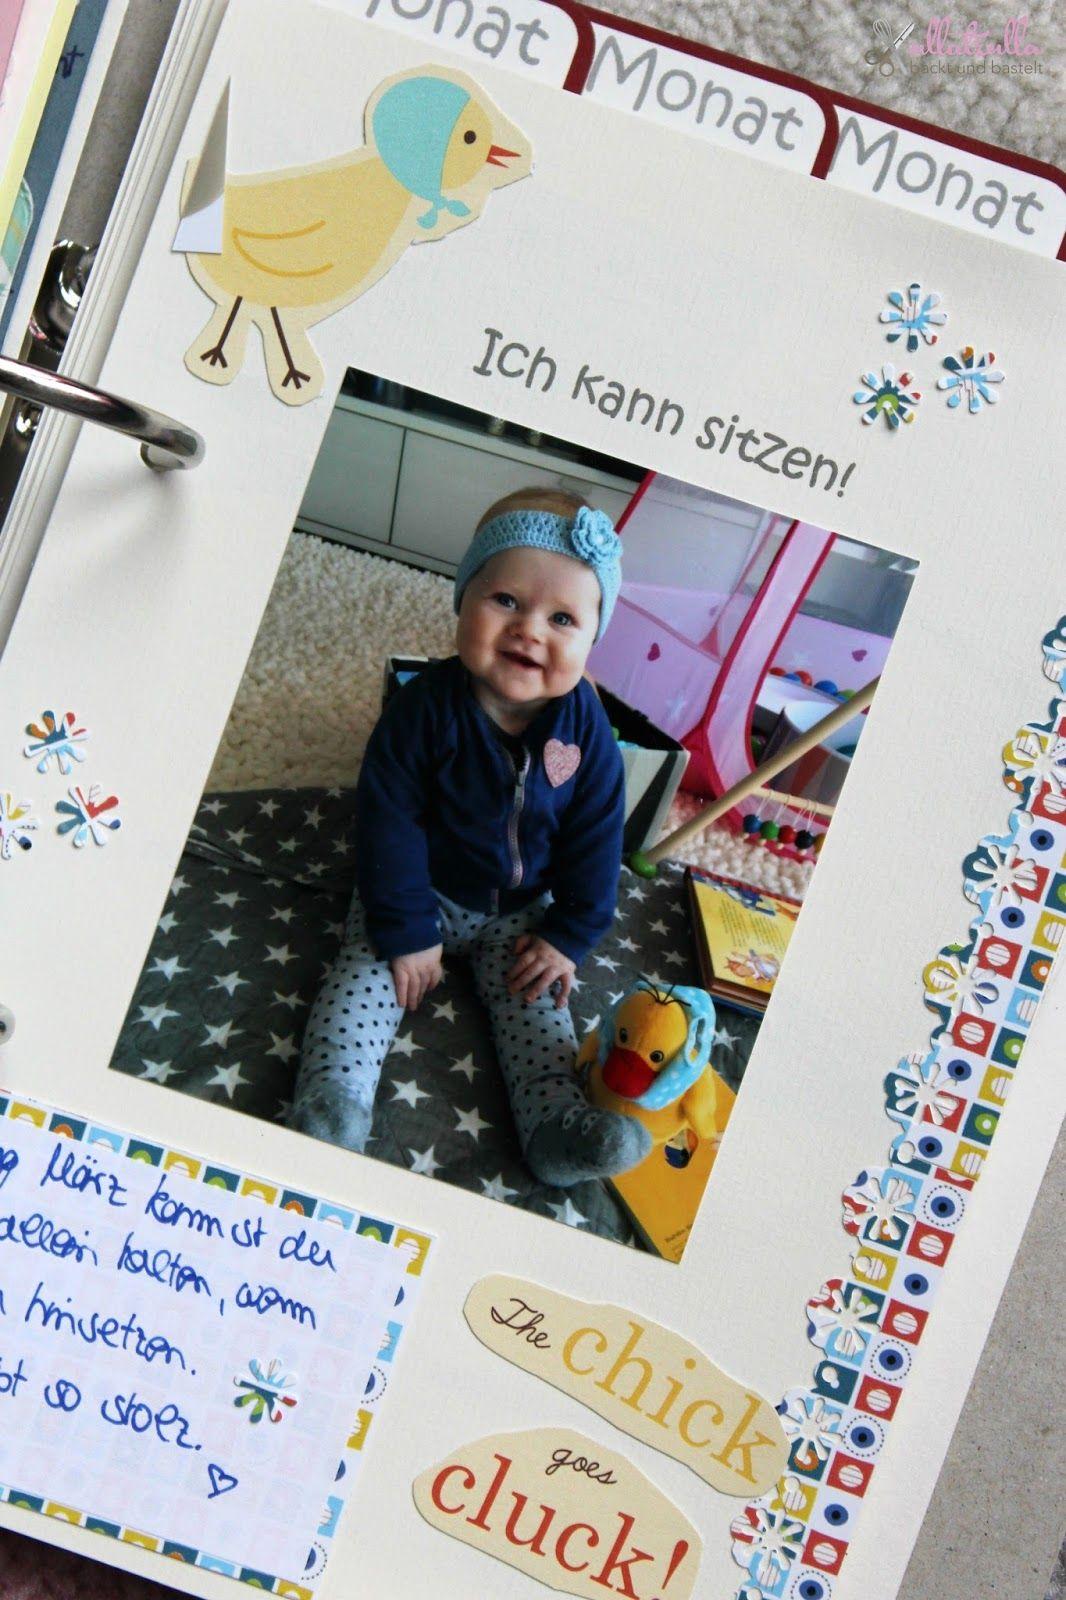 Ullatrulla backt und bastelt diy babyalbum selber gestalten gewinnspiel geschlossen - Fotoalbum ideen ...